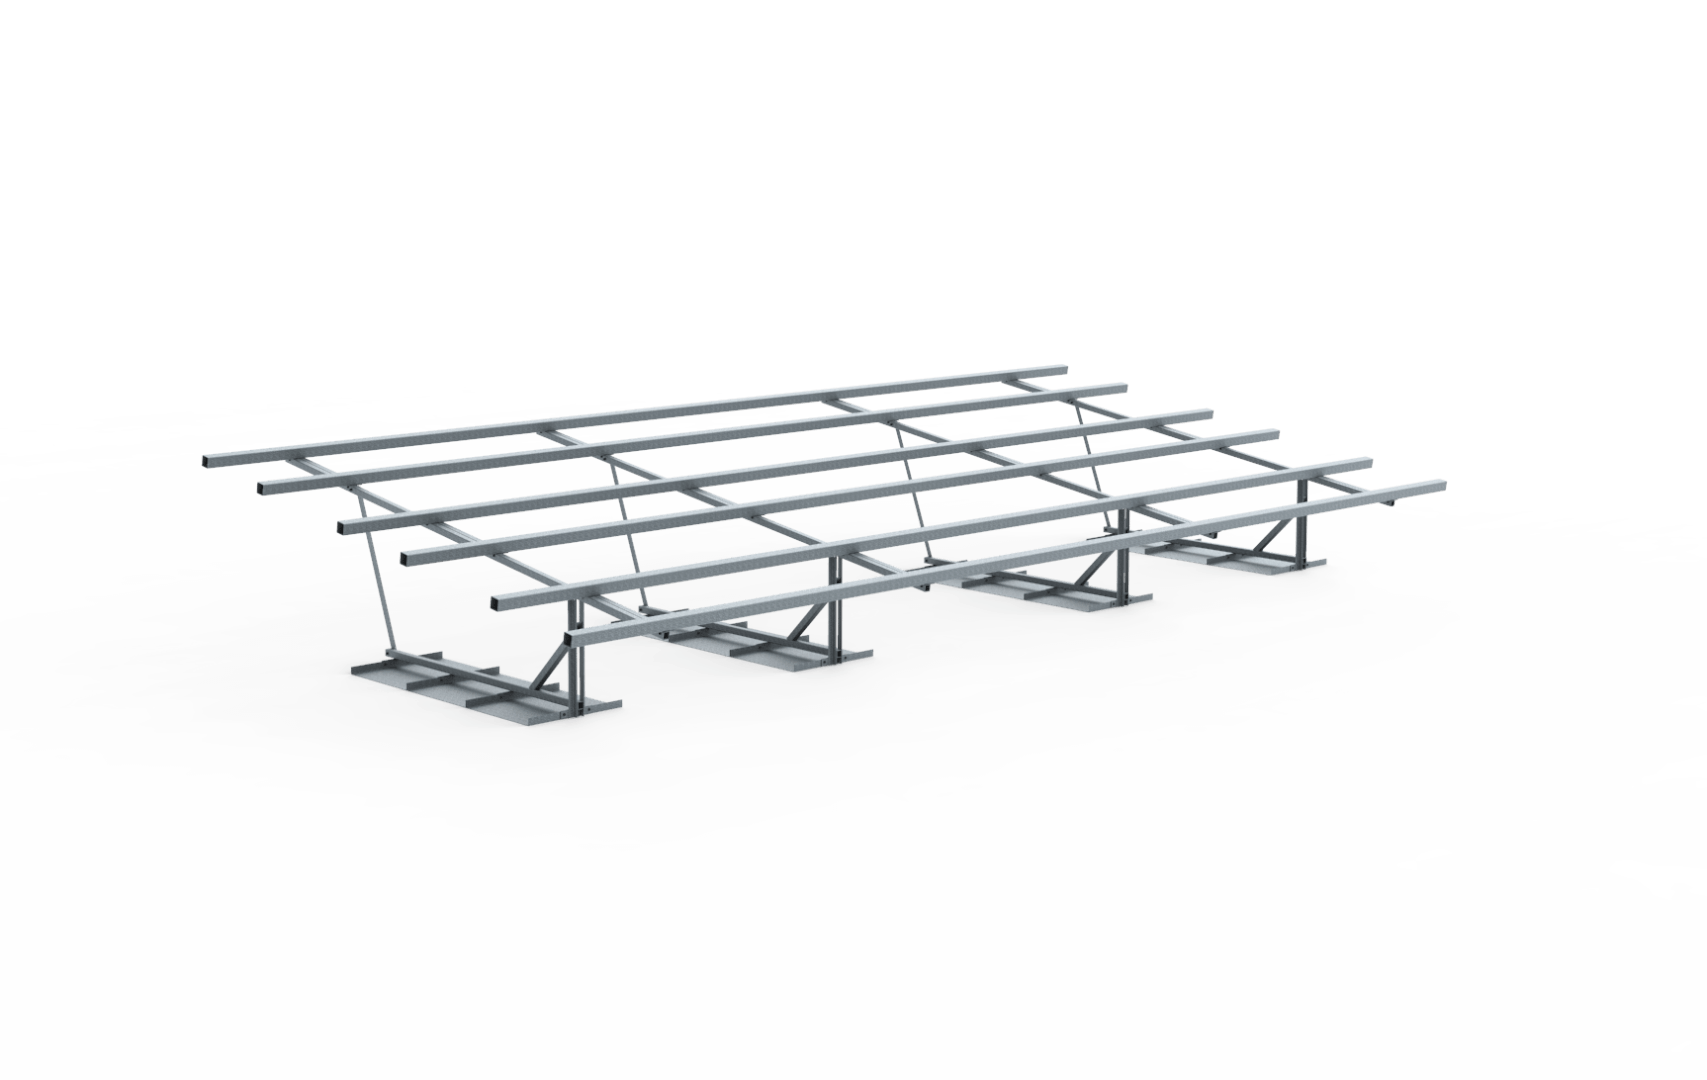 Frame vrije veldopstelling 27 zonnepanelen